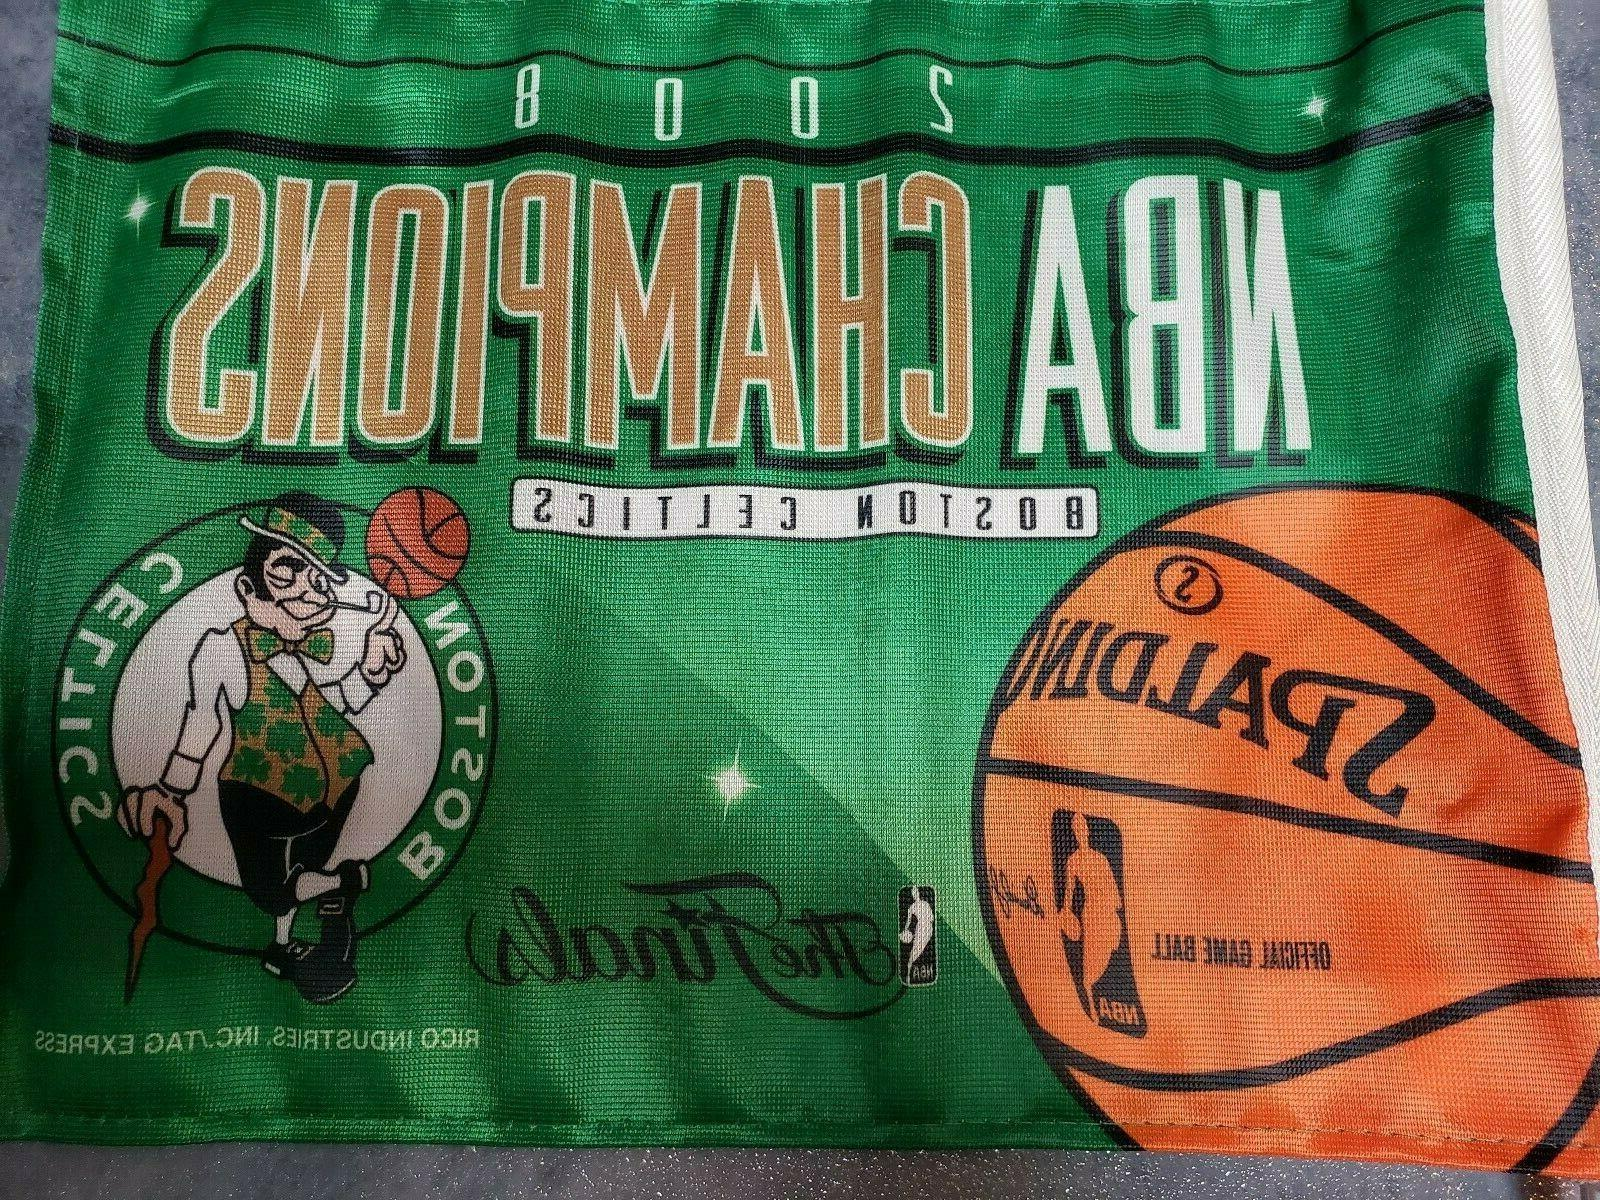 Boston Celtics 2008 TRUCK TWO SIDE Man must Colors